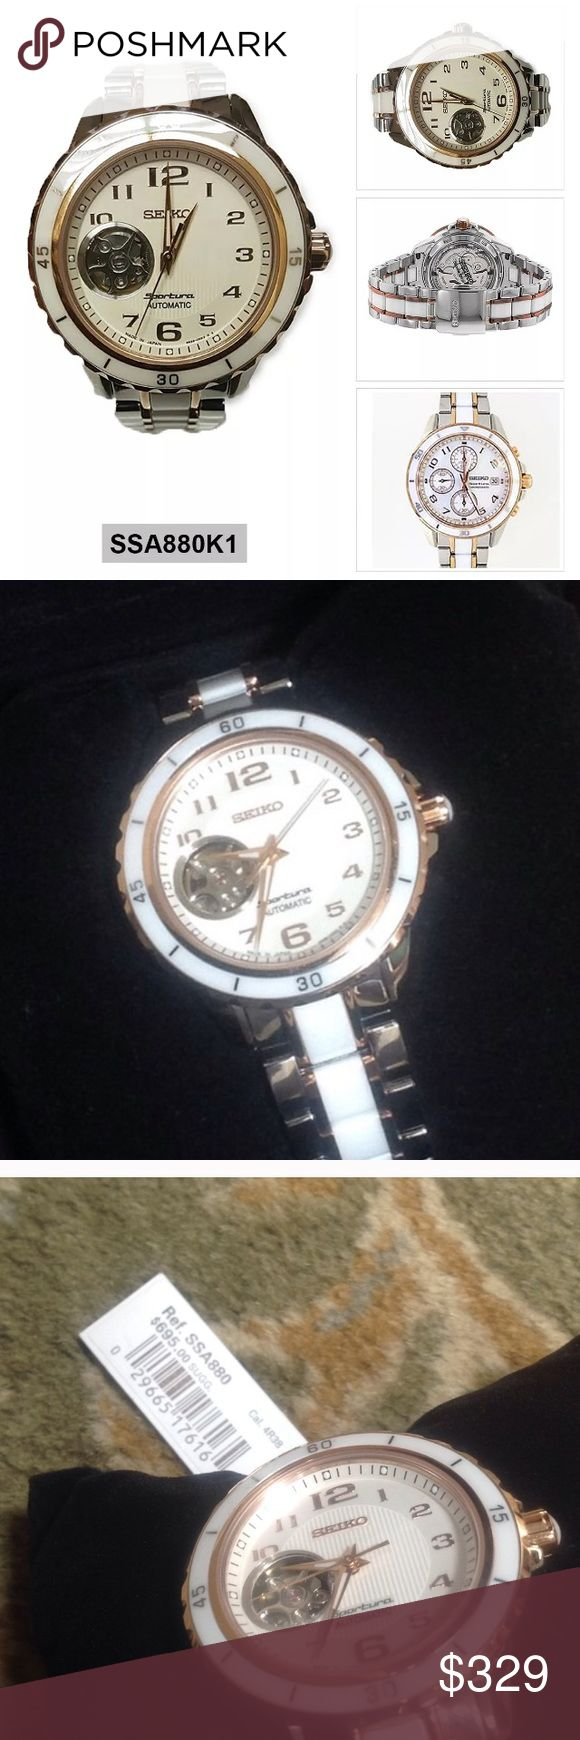 Seiko sportura $700 new rose gold ceramic watch Brand new seiko sportura ceramic watch with $700 price tag attached. Includes original box . A great deal! Seiko Accessories Watches